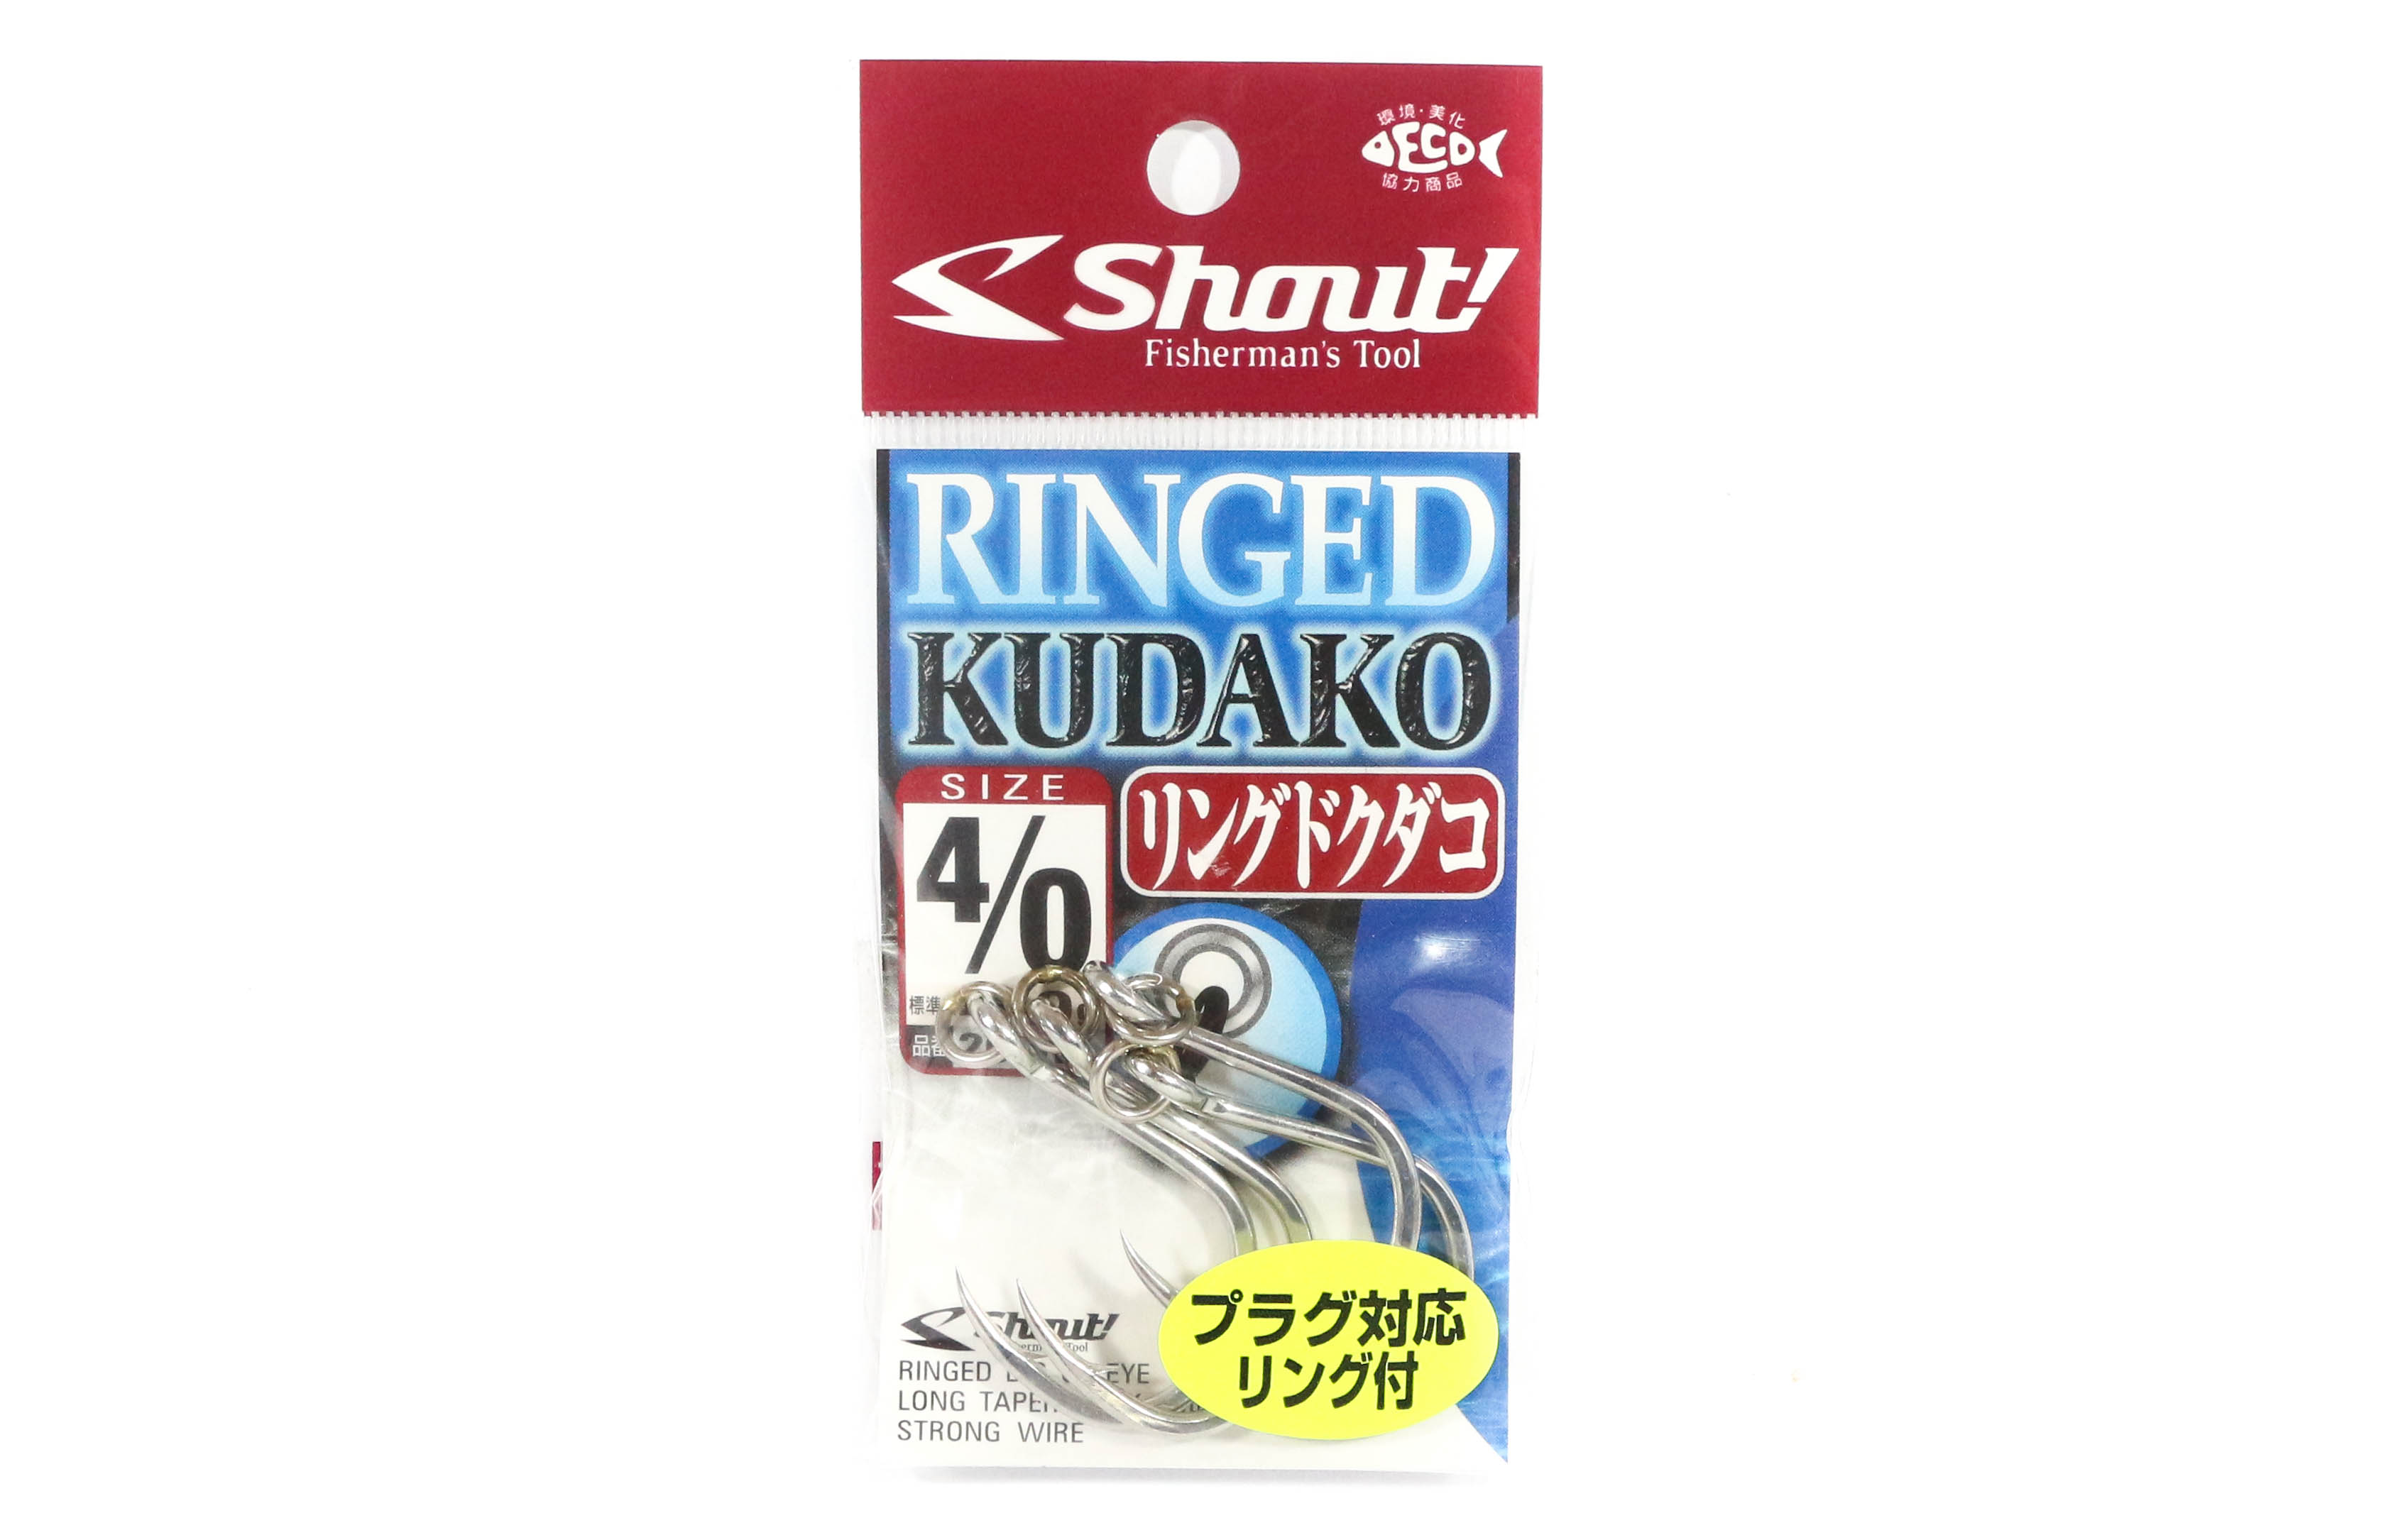 Shout 207-RK Ringed Kudako Power Jigging Single Hook Silver Size 4/0 (7858)